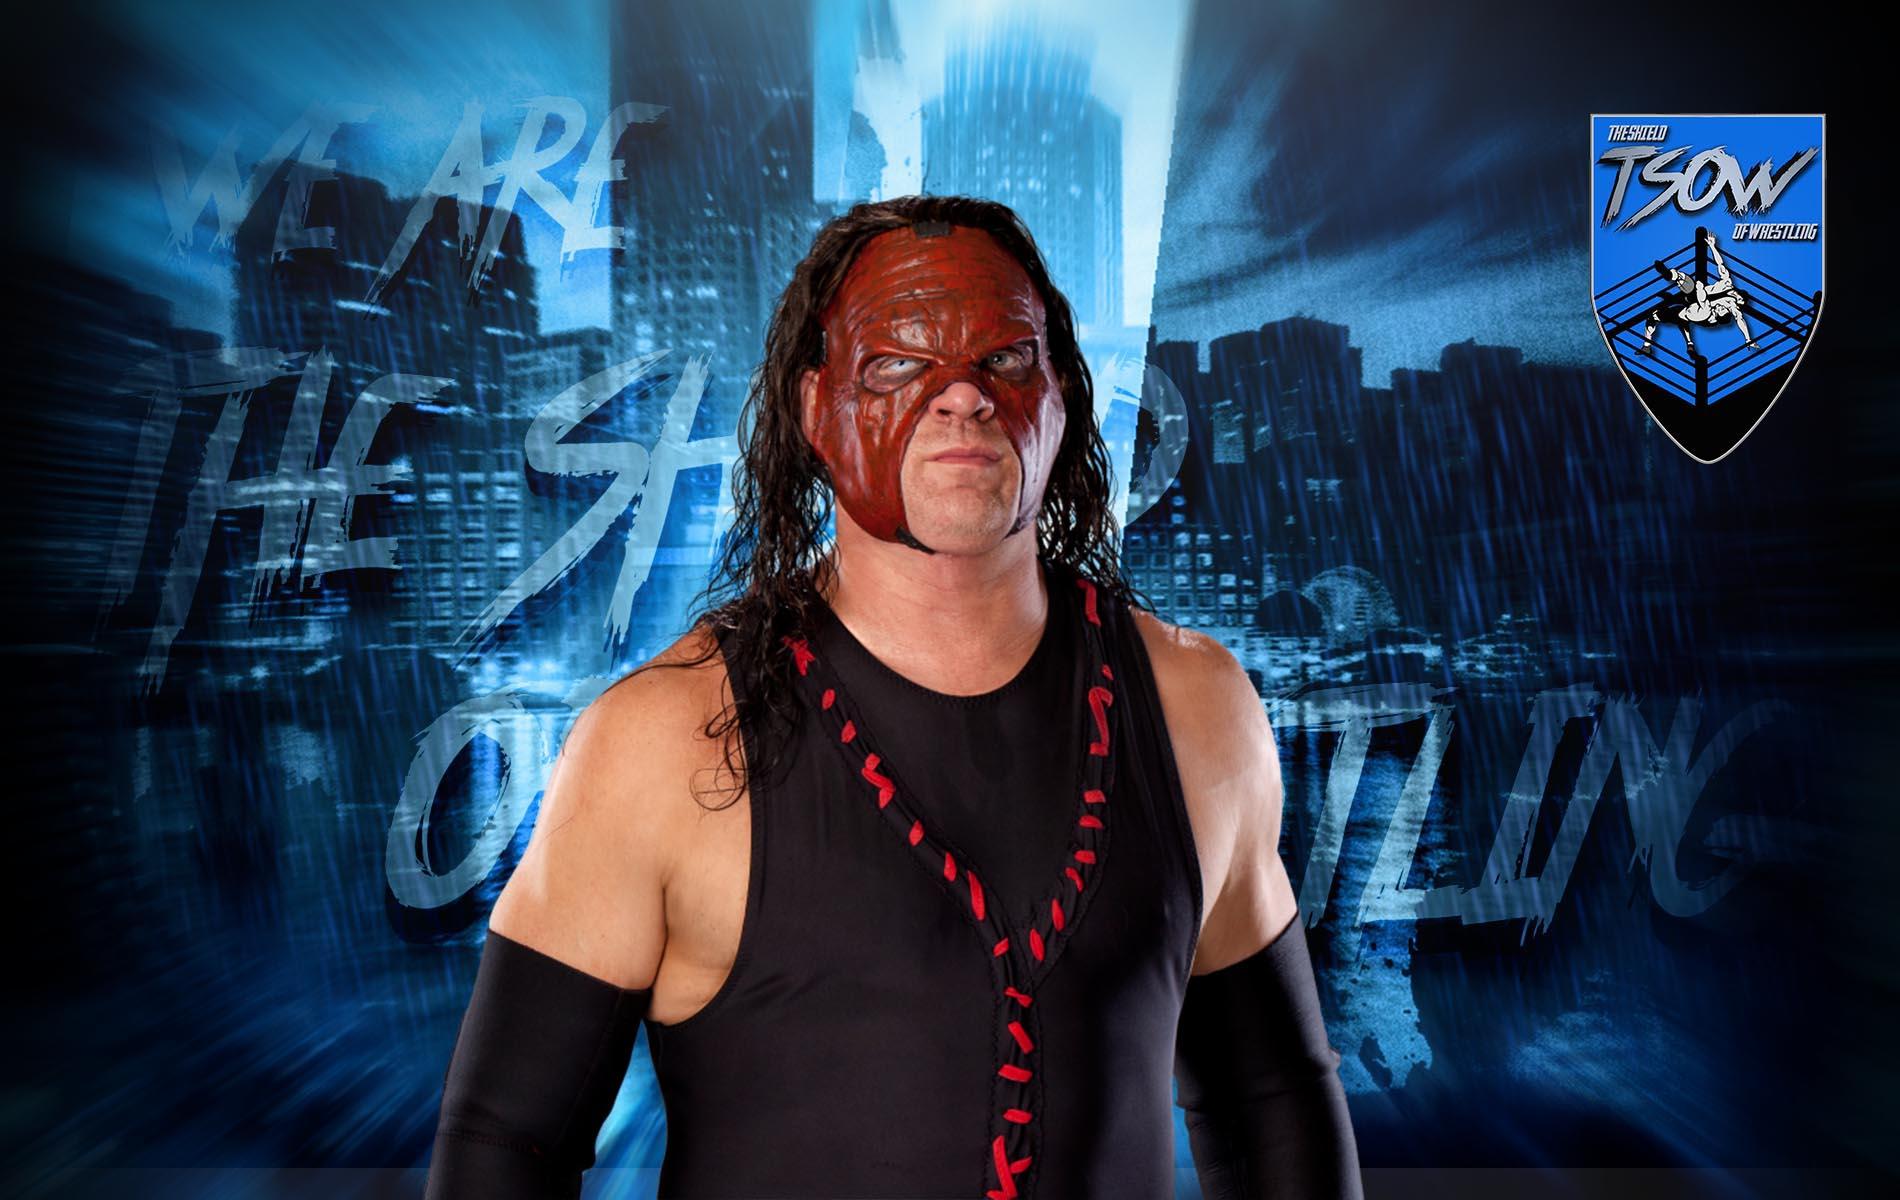 Kane sponsorizza una nuova palestra di Pro-Wrestling